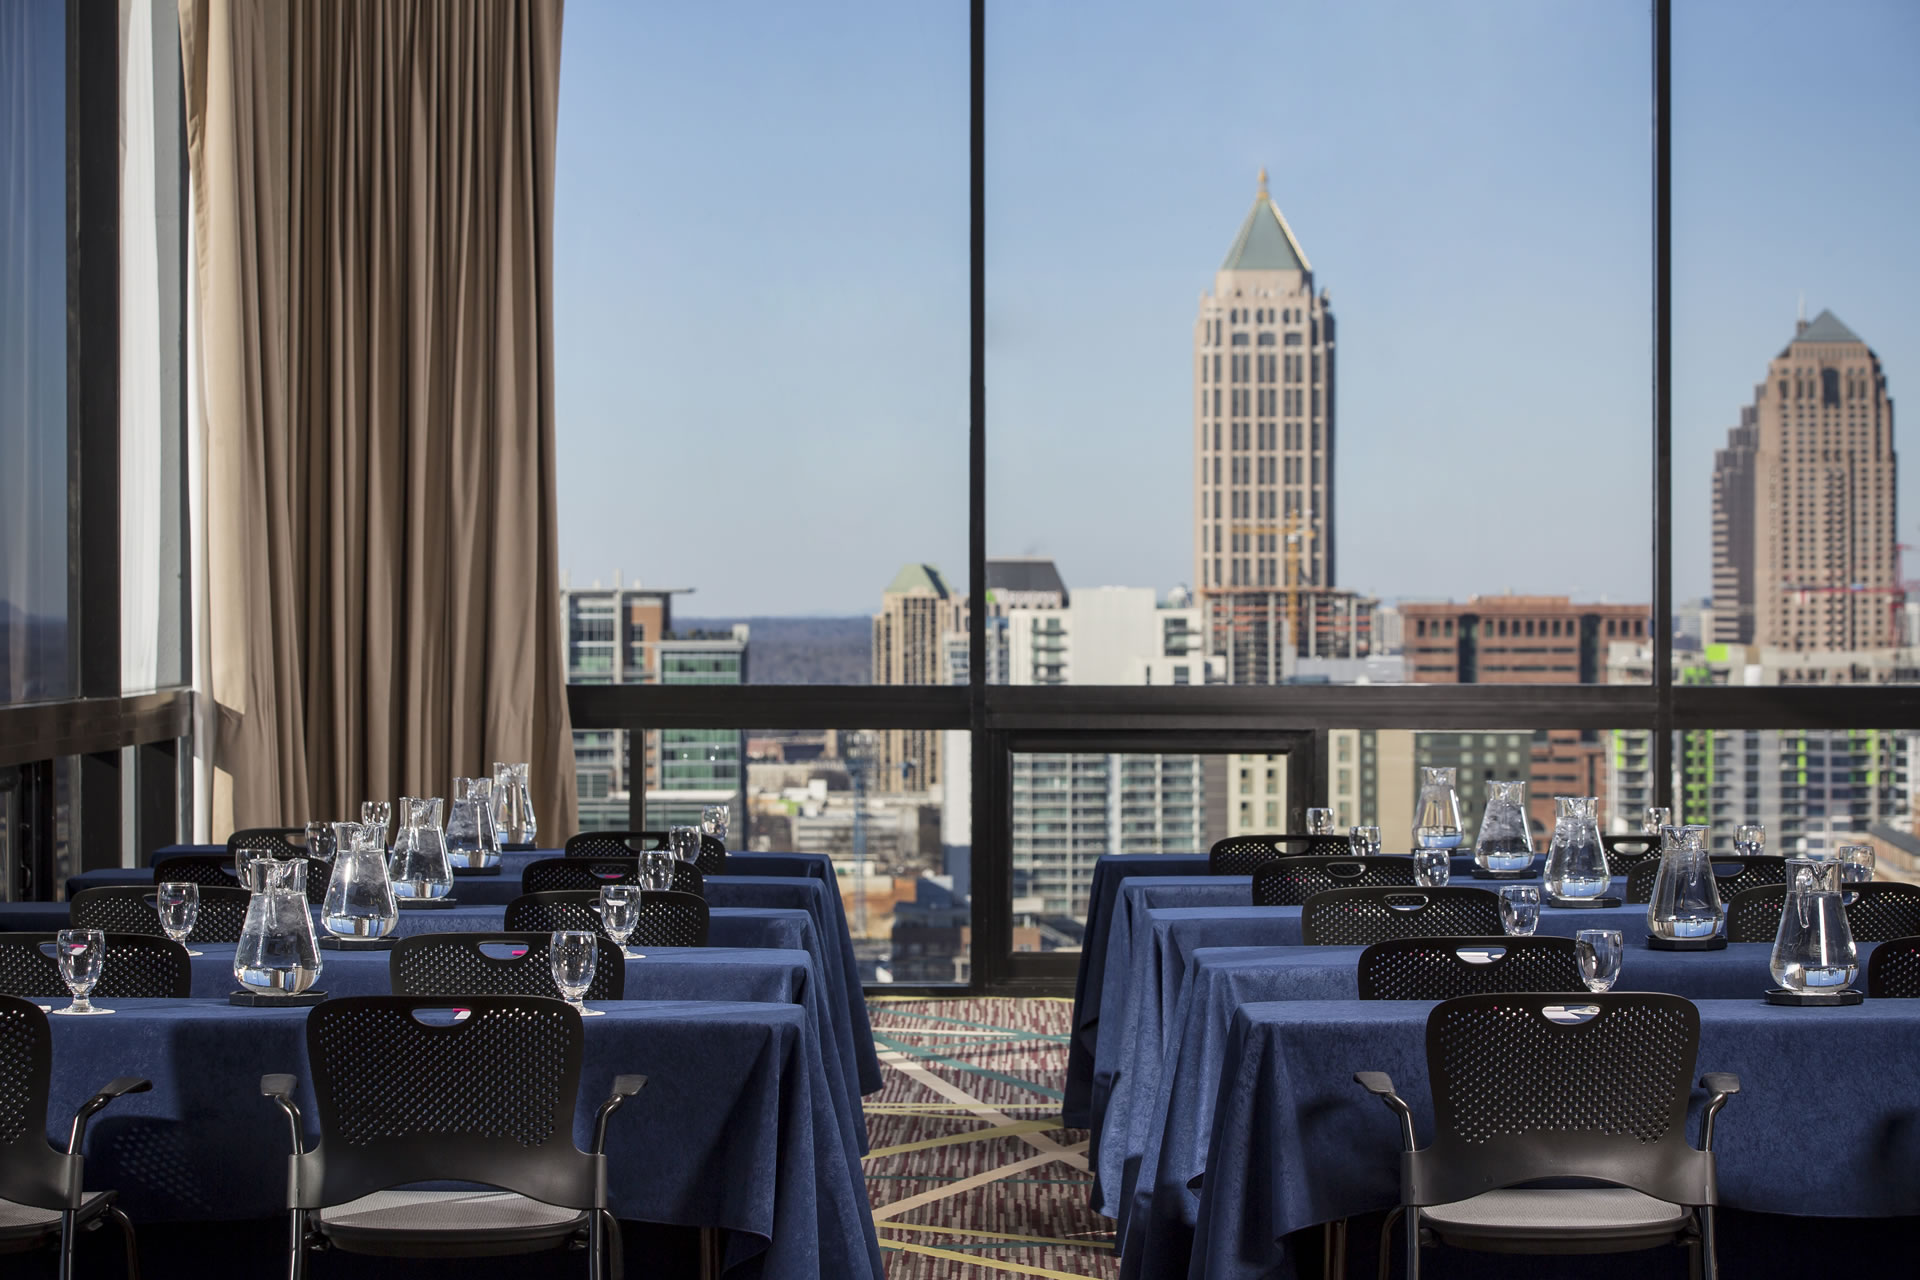 Classroom-style room setup in SKY Room West, overlooking the Atlanta skyline at Crowne Plaza Atlanta Midtown.